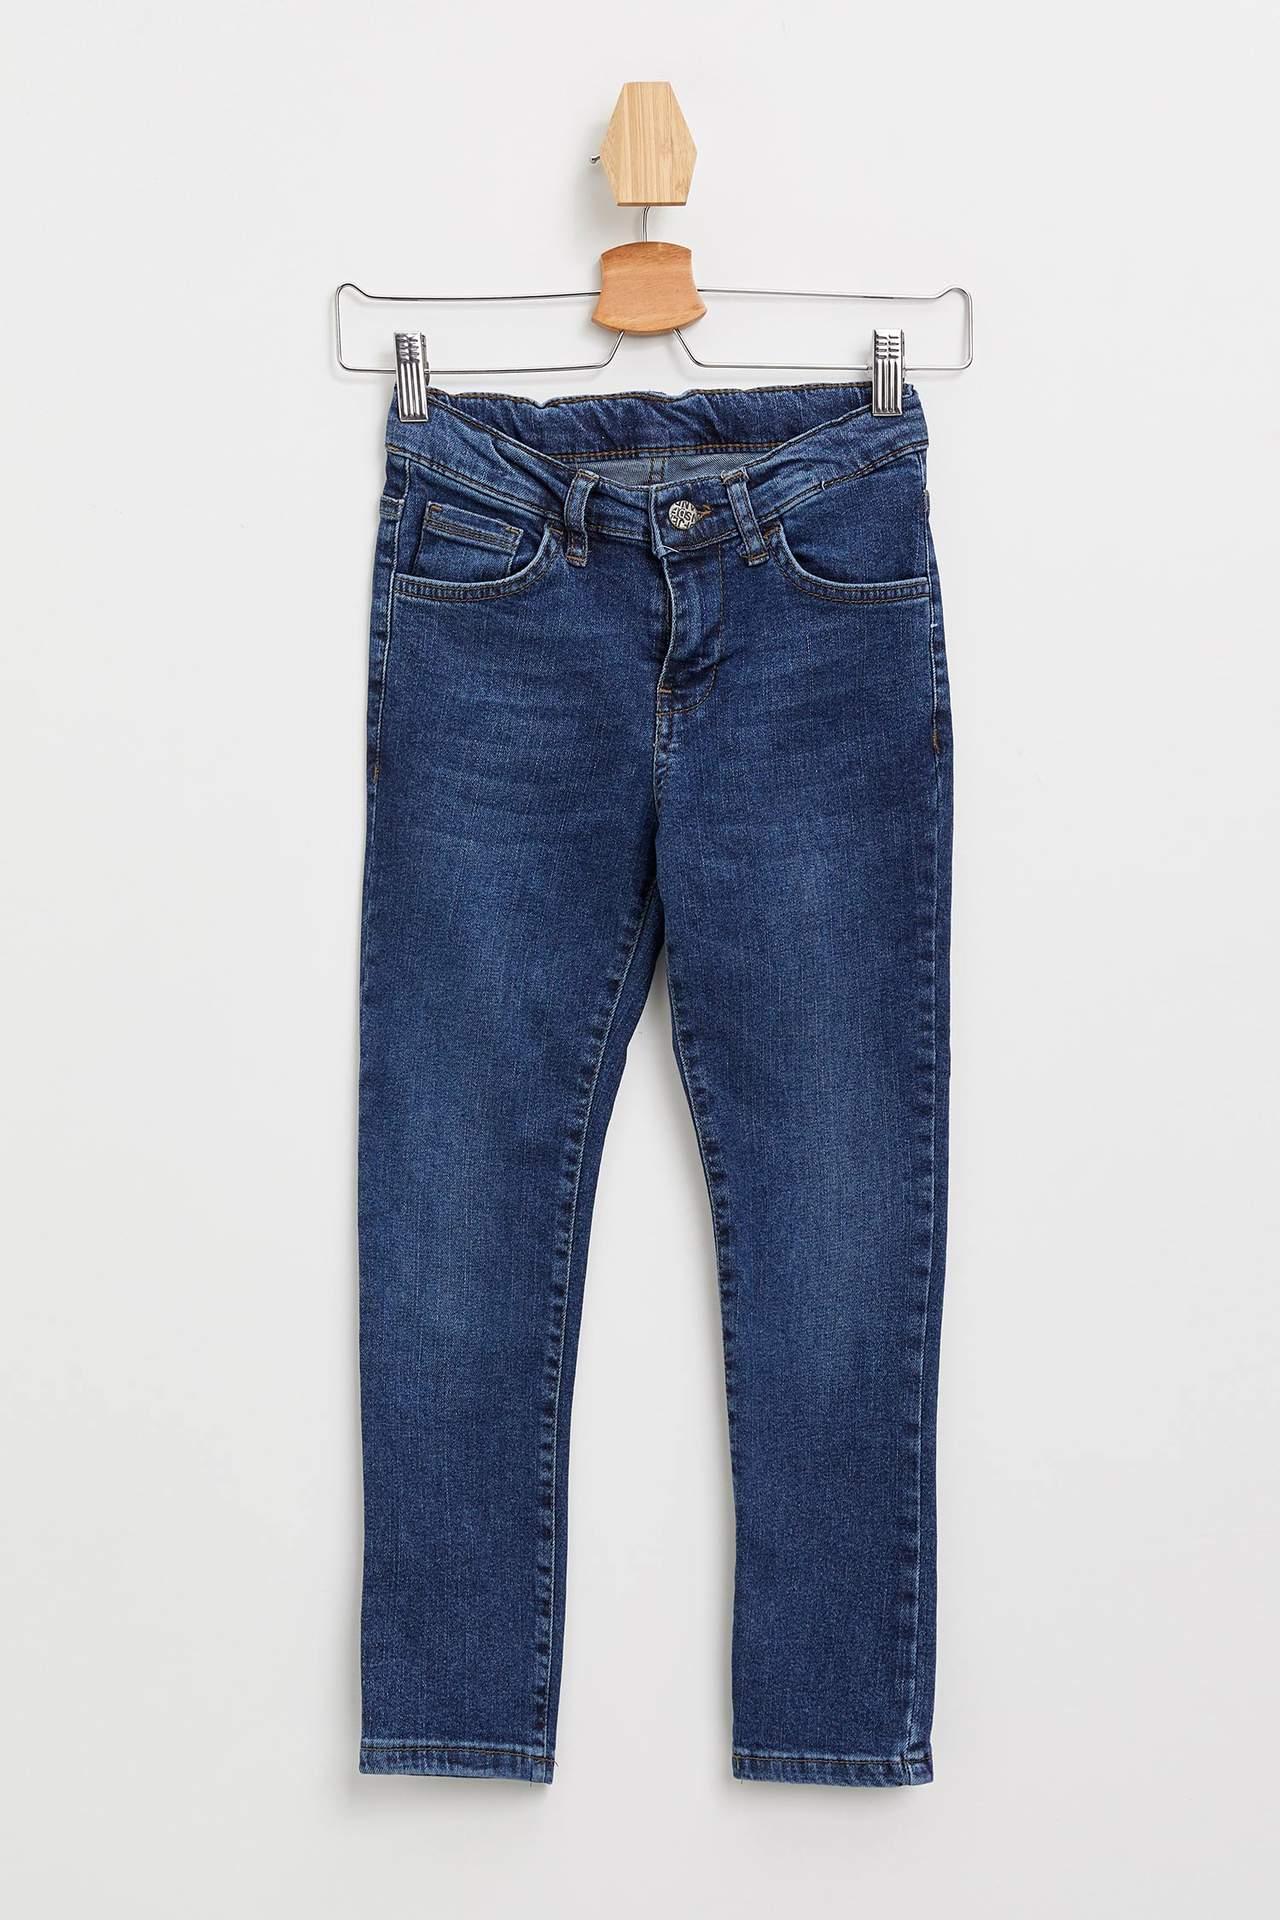 DeFacto Erkek Çocuk Slim Fit Jean Pantolon Mavi male